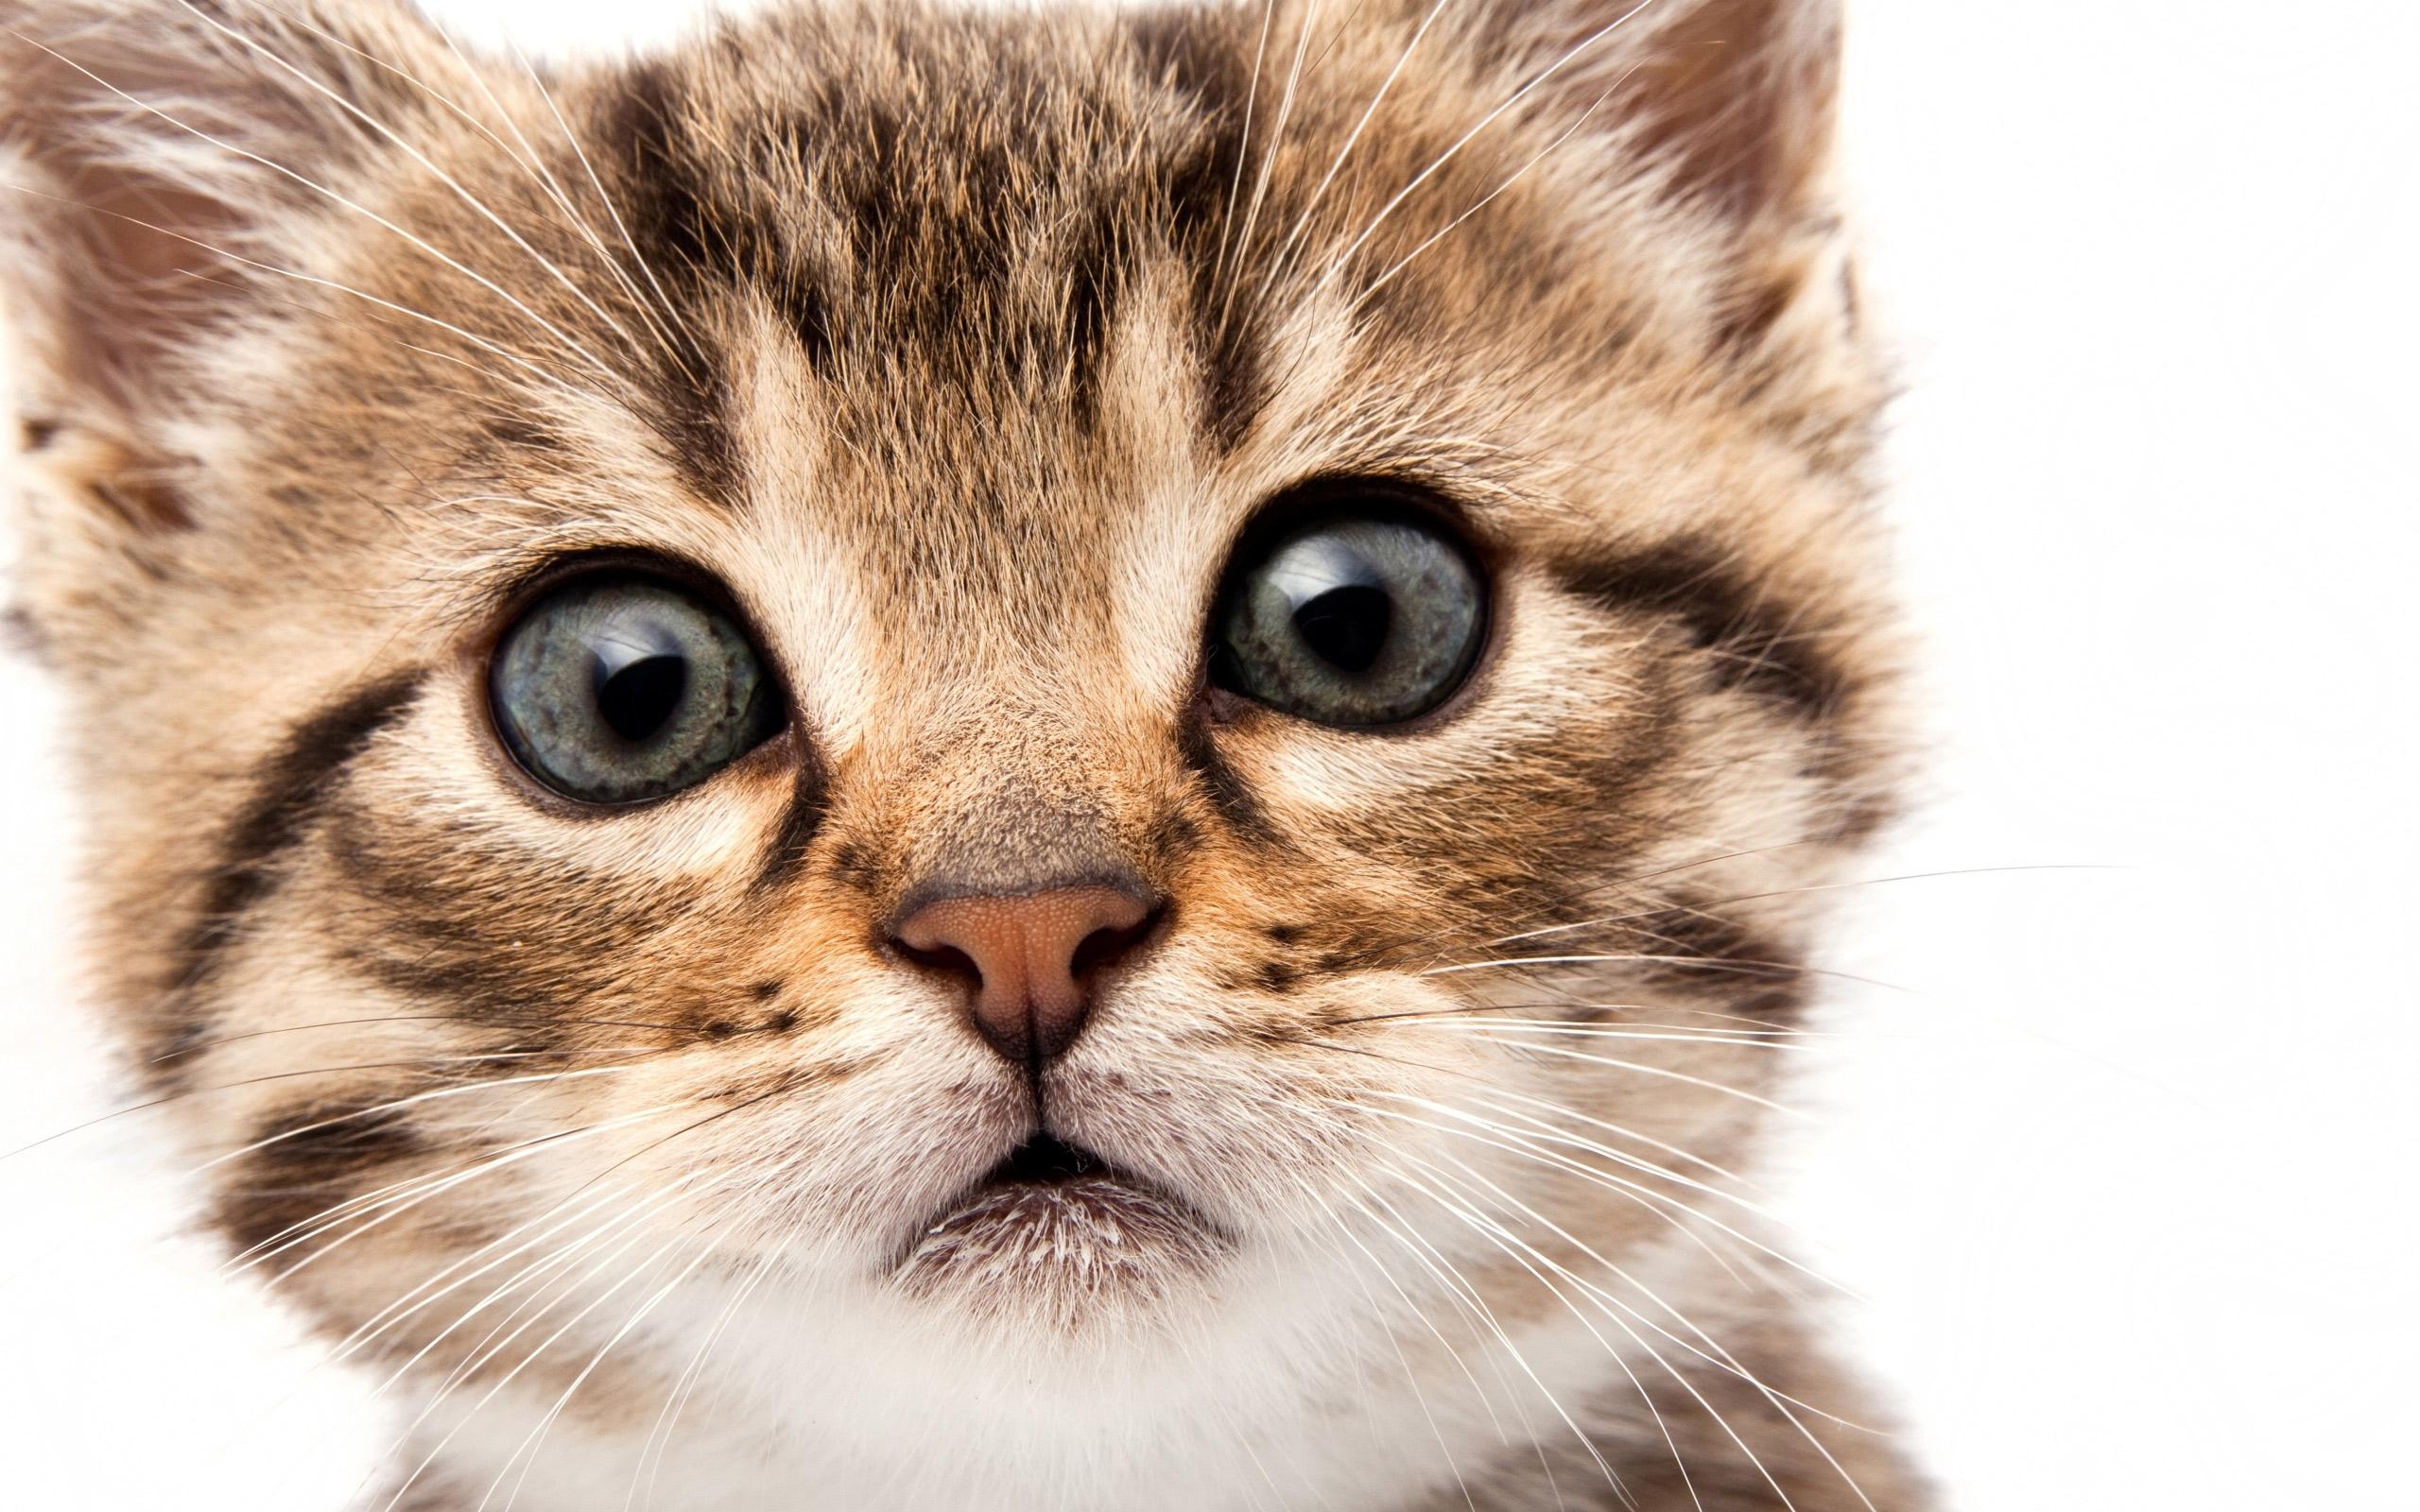 Обои на телефон котята красивые (2)